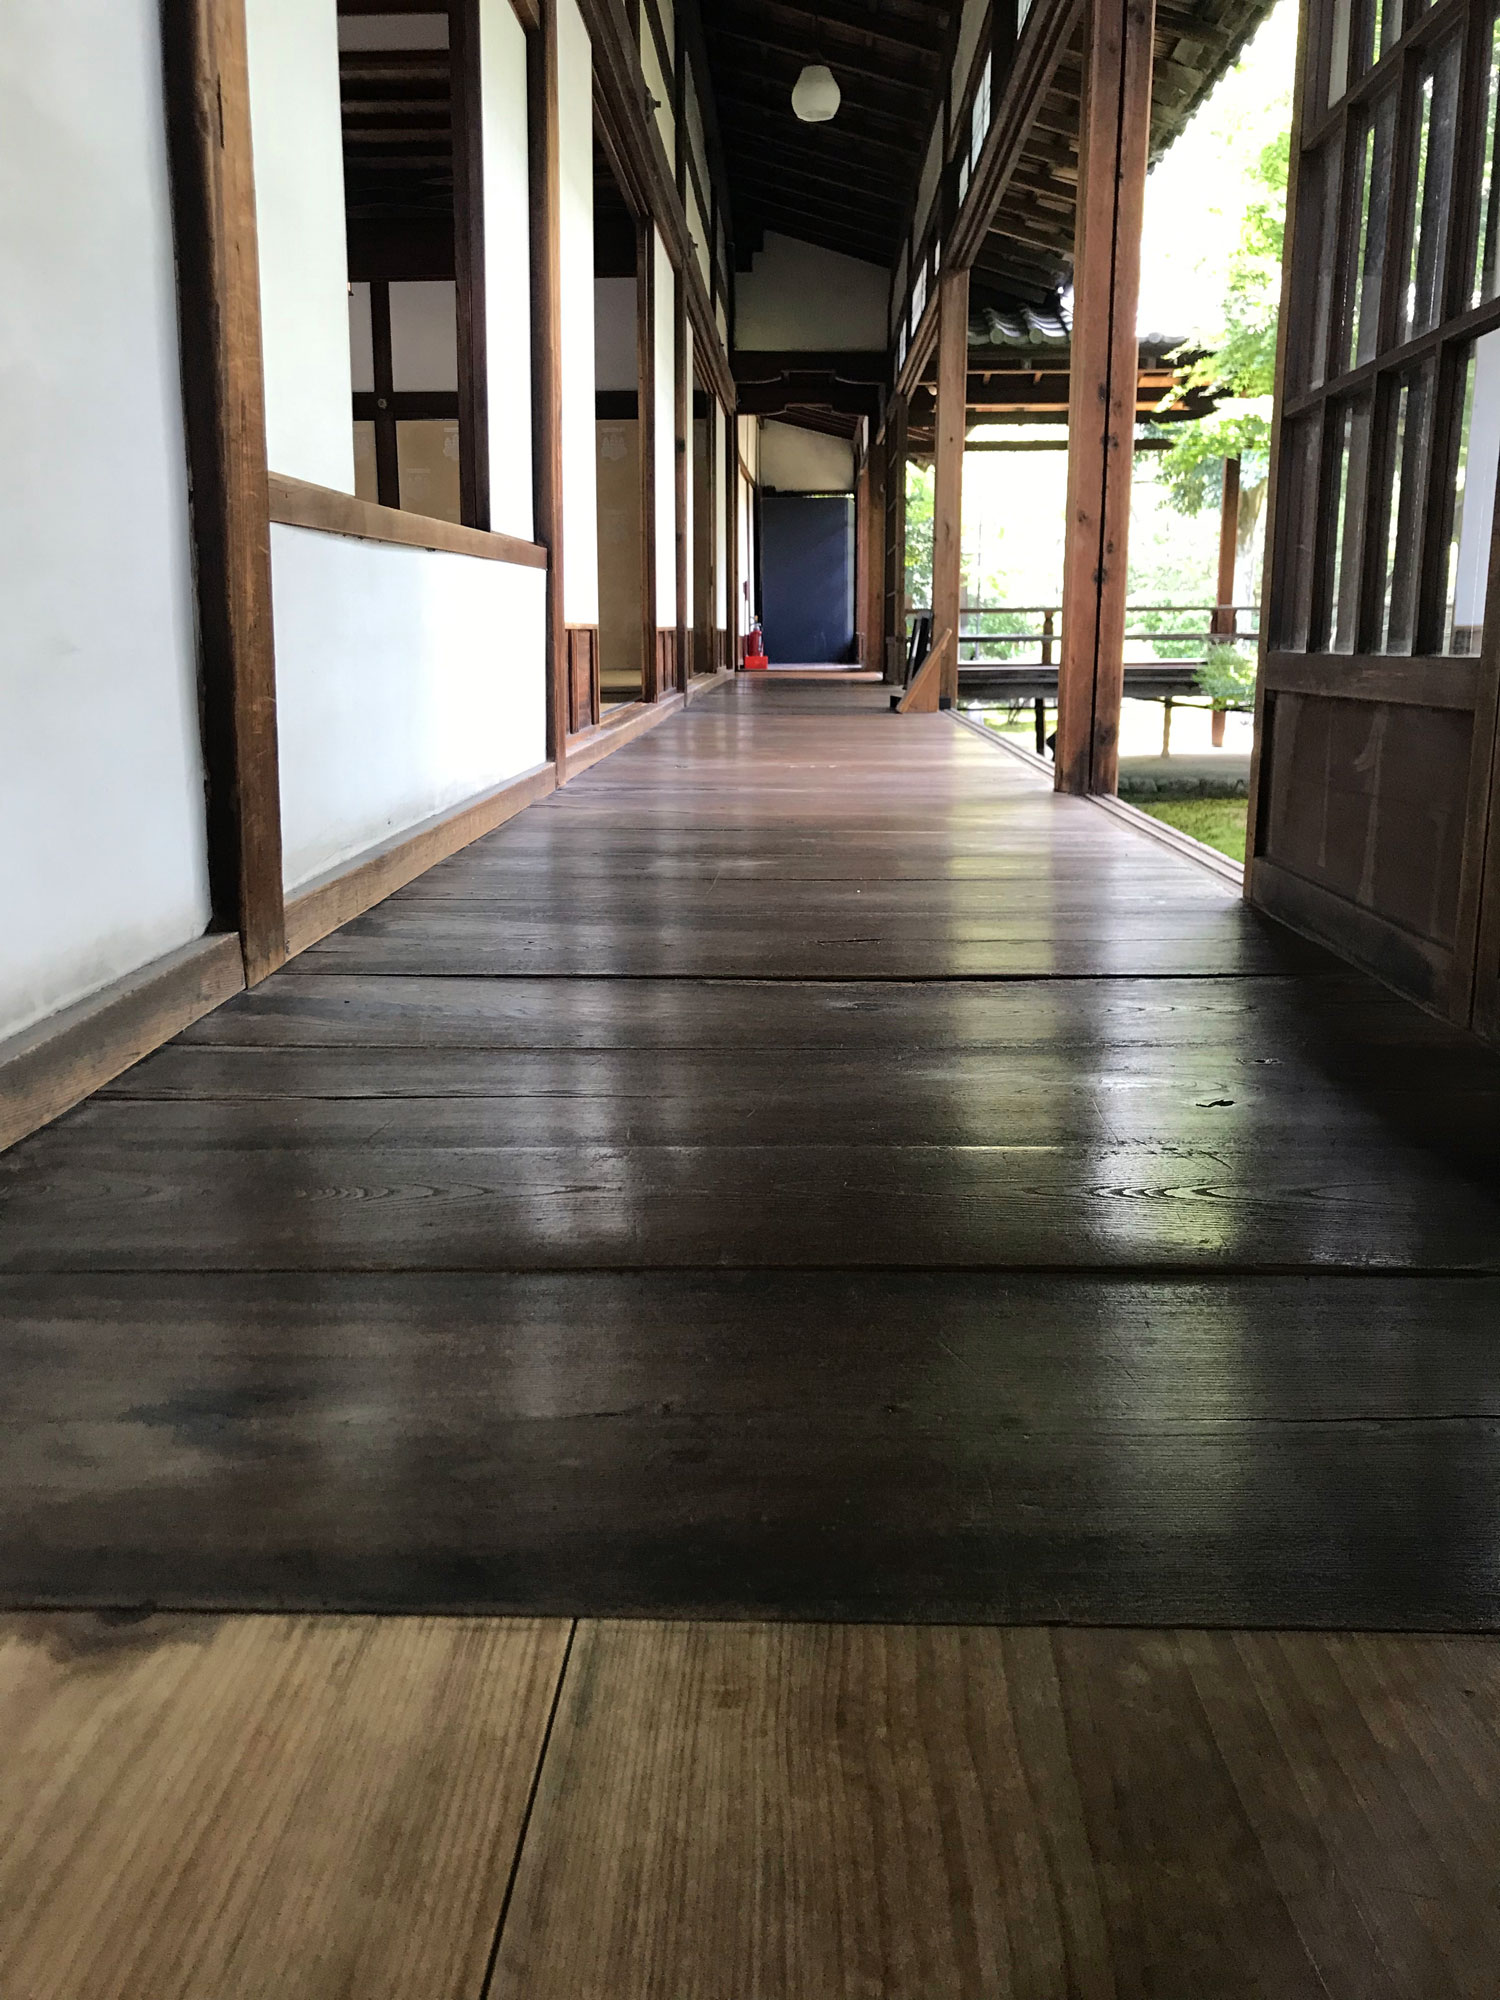 Kennin-ji-ZEN-Tempel-07b.jpg